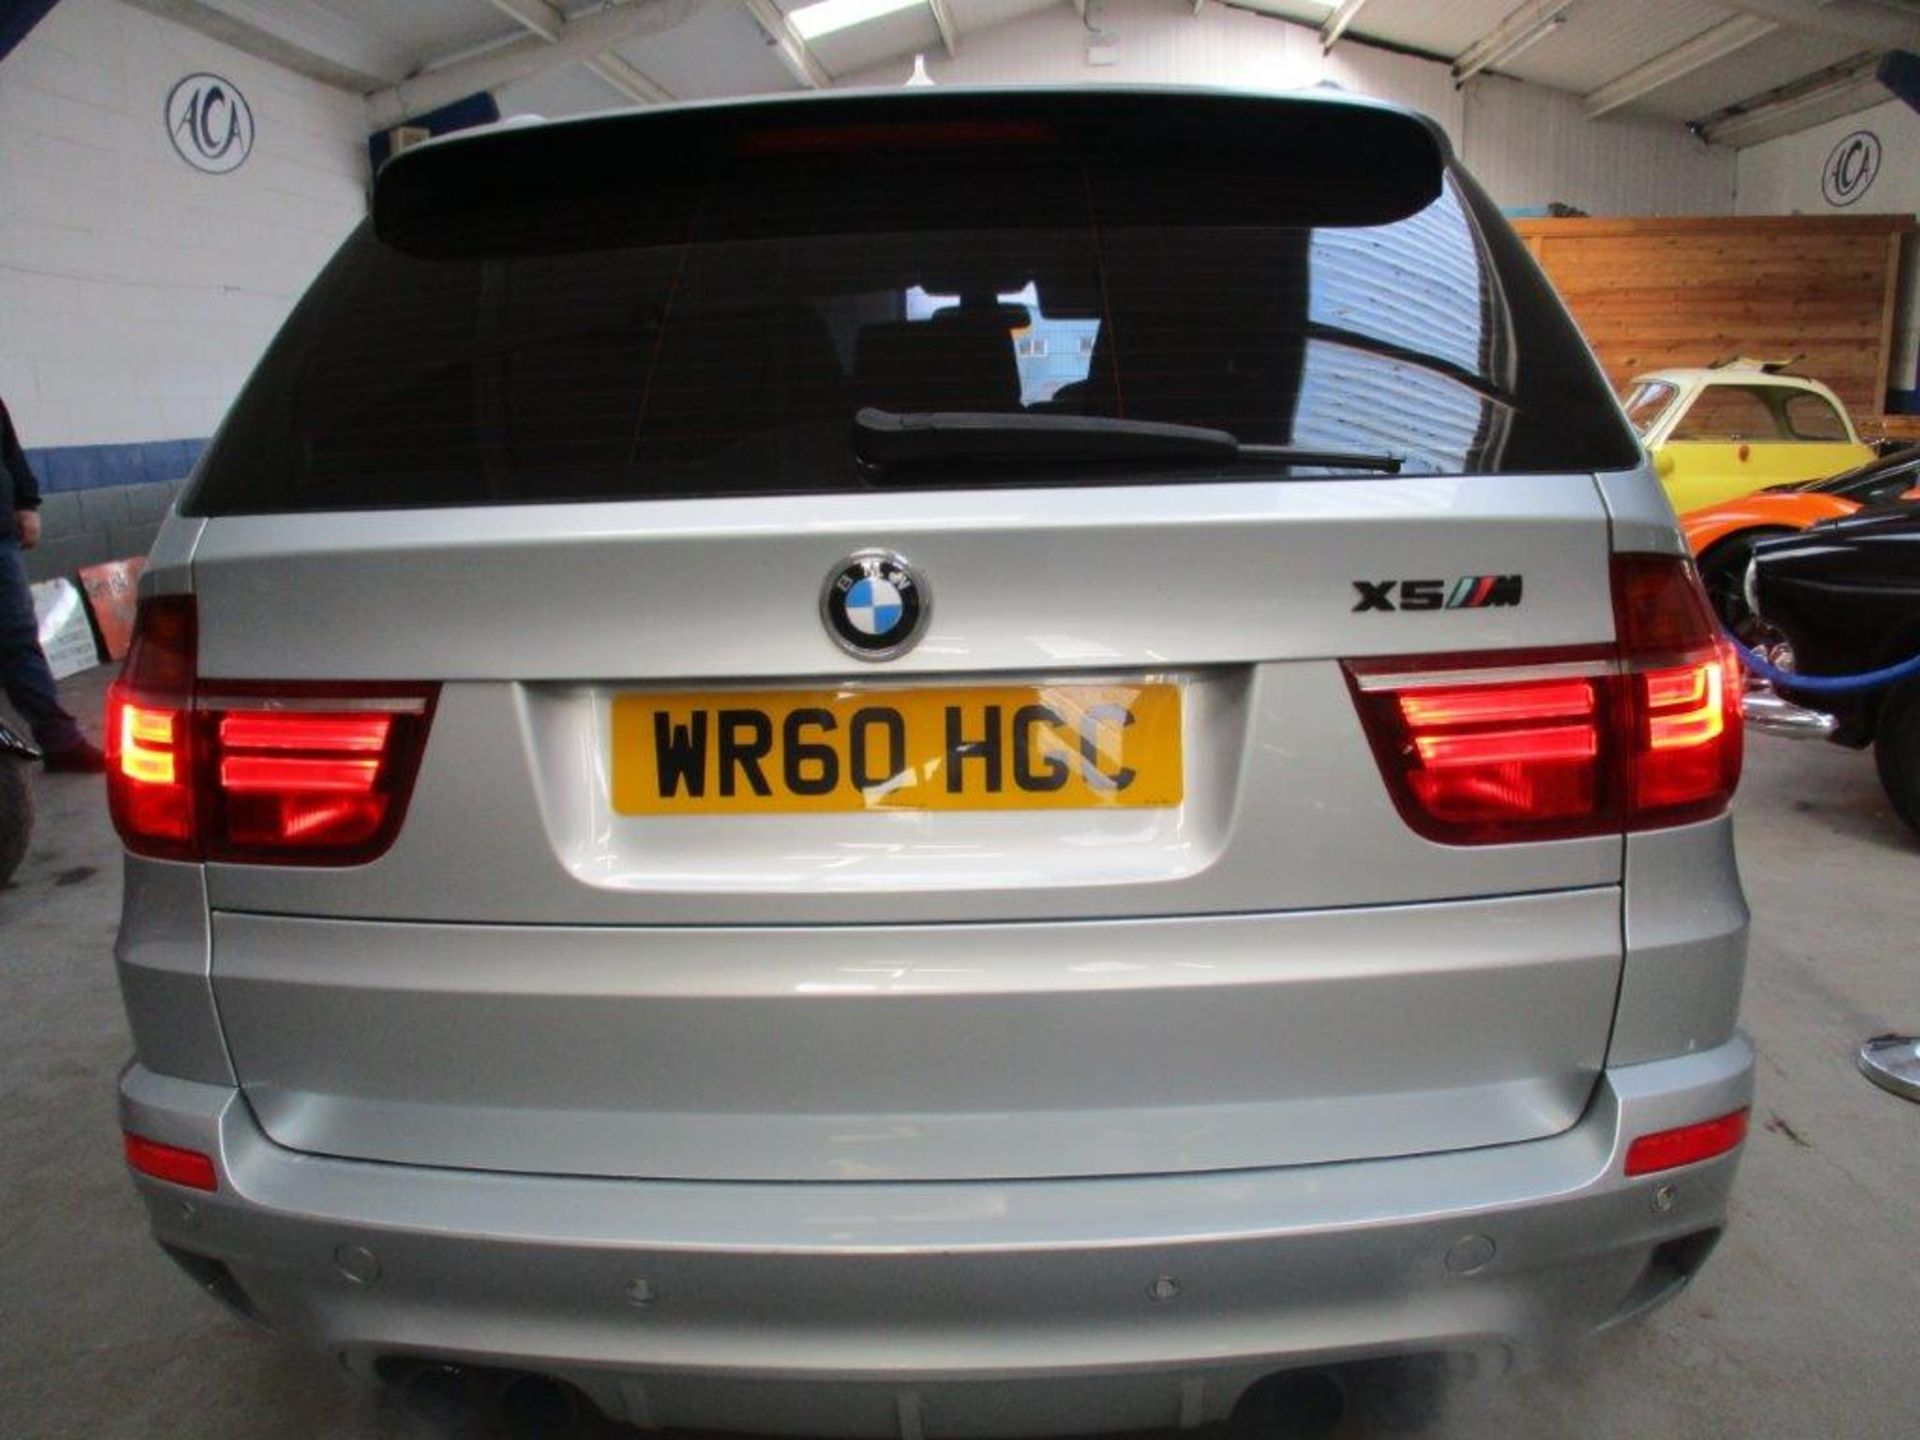 60 10 BMW X5 M Turbo Auto - Image 3 of 35